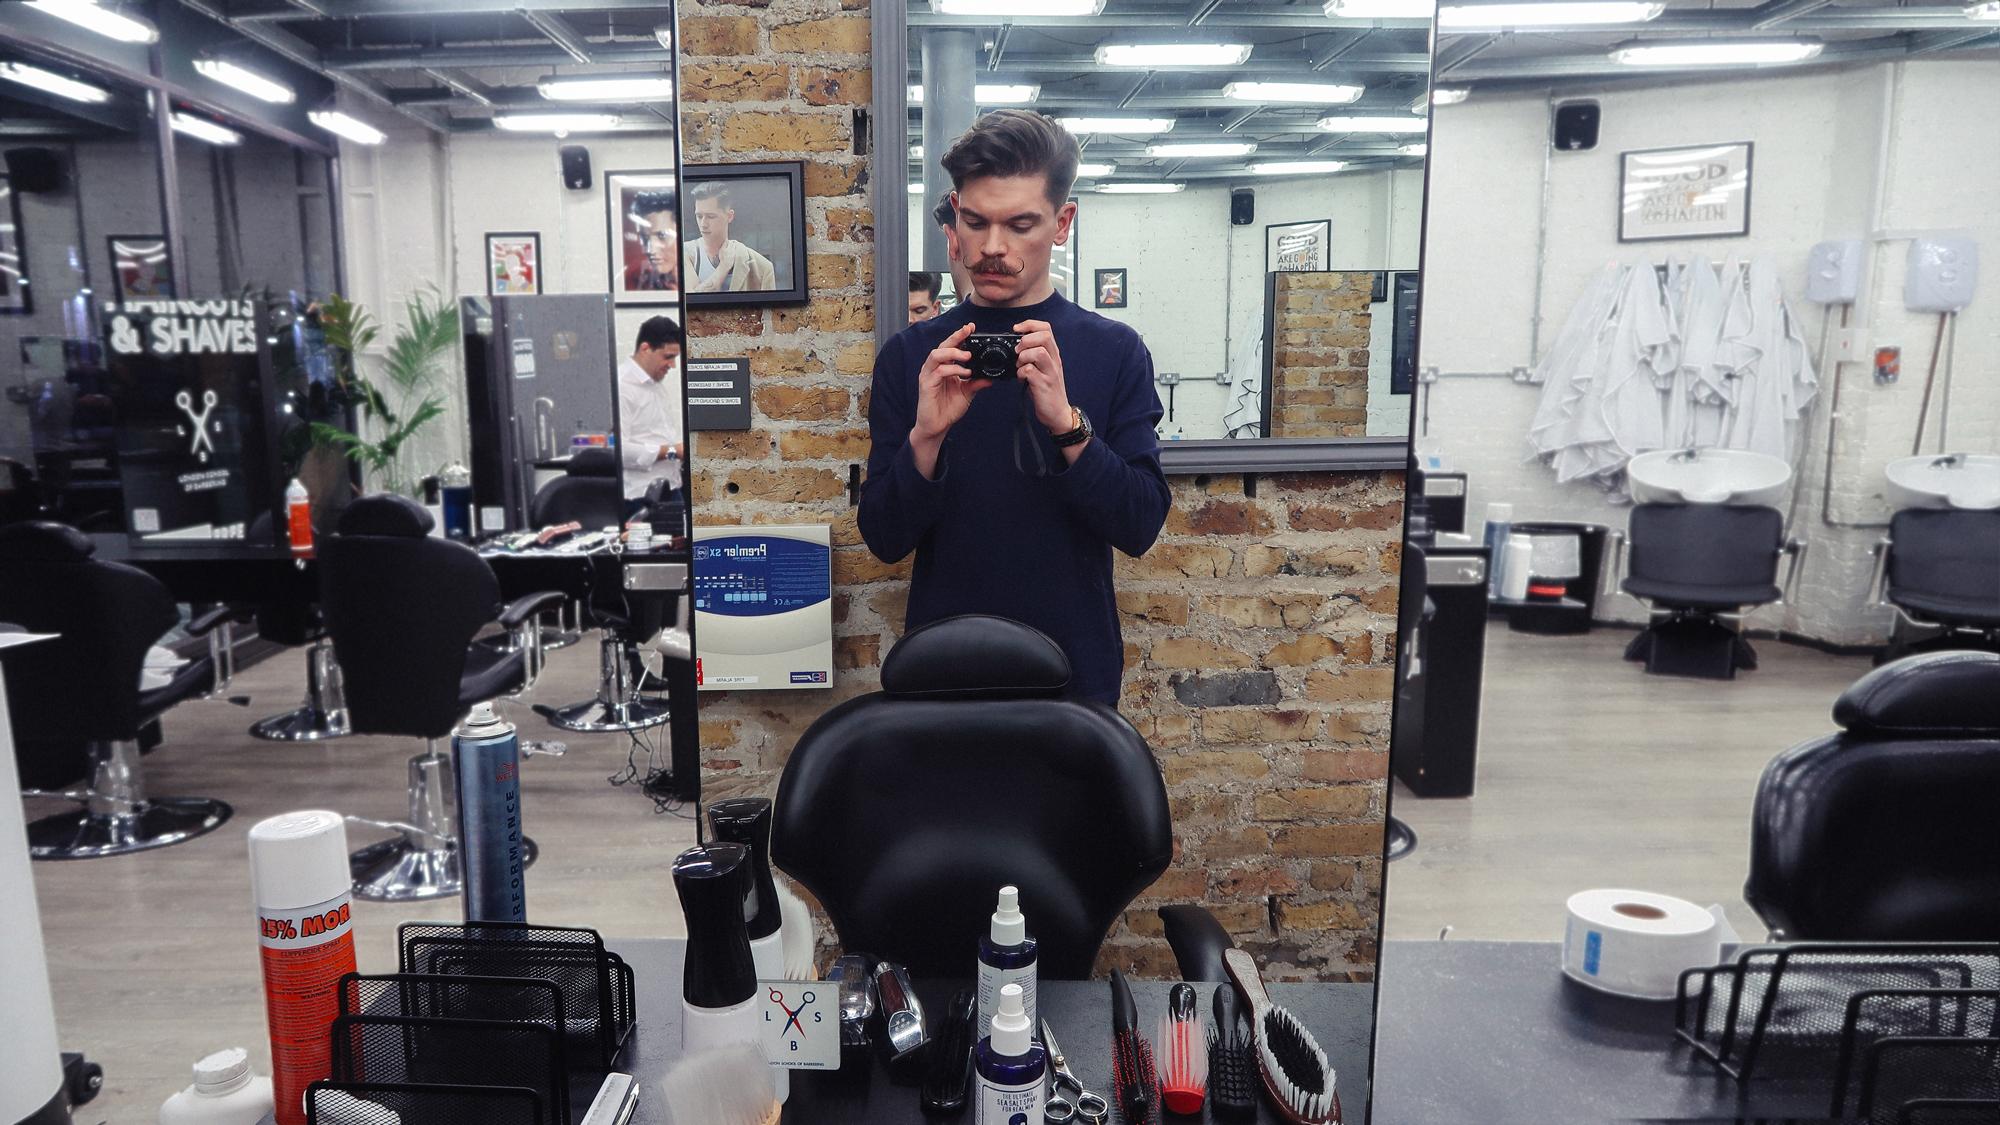 Barber Announcement